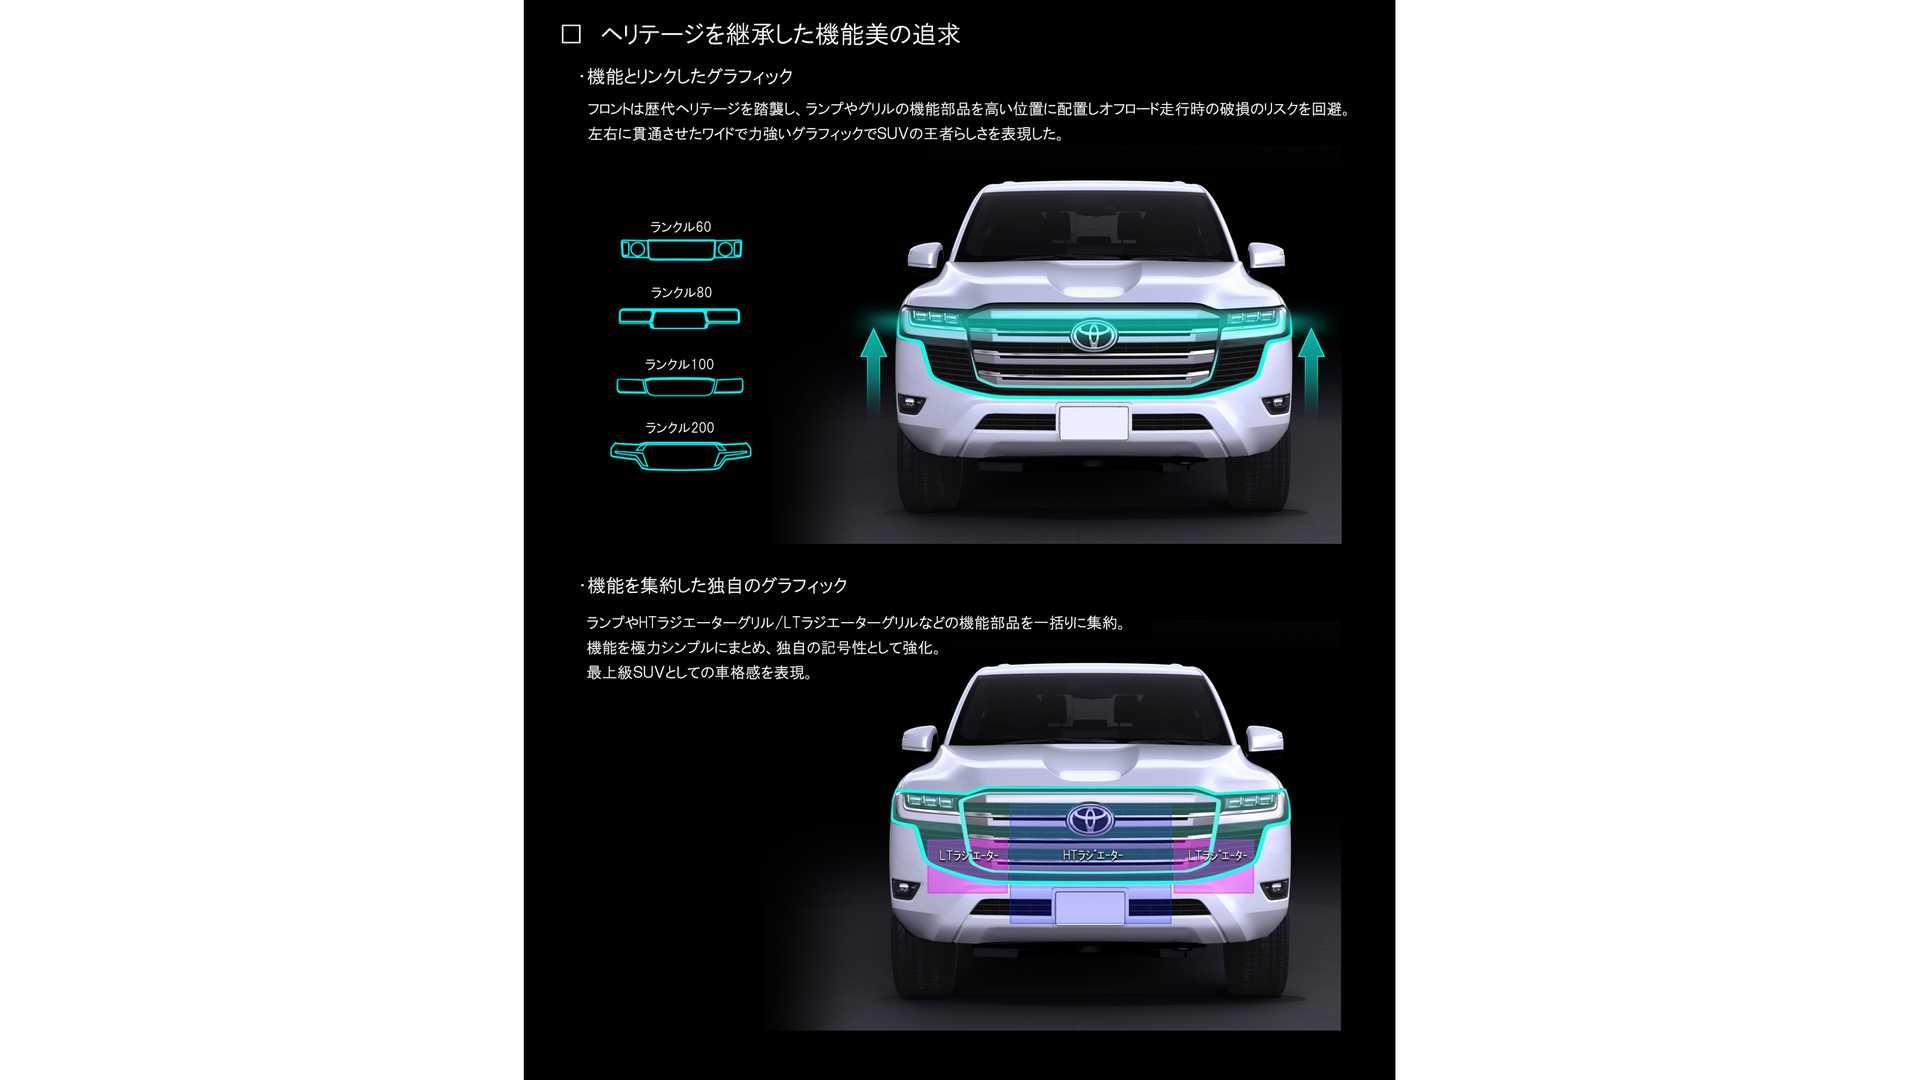 Toyota-Land-Cruiser-design-sketches-16